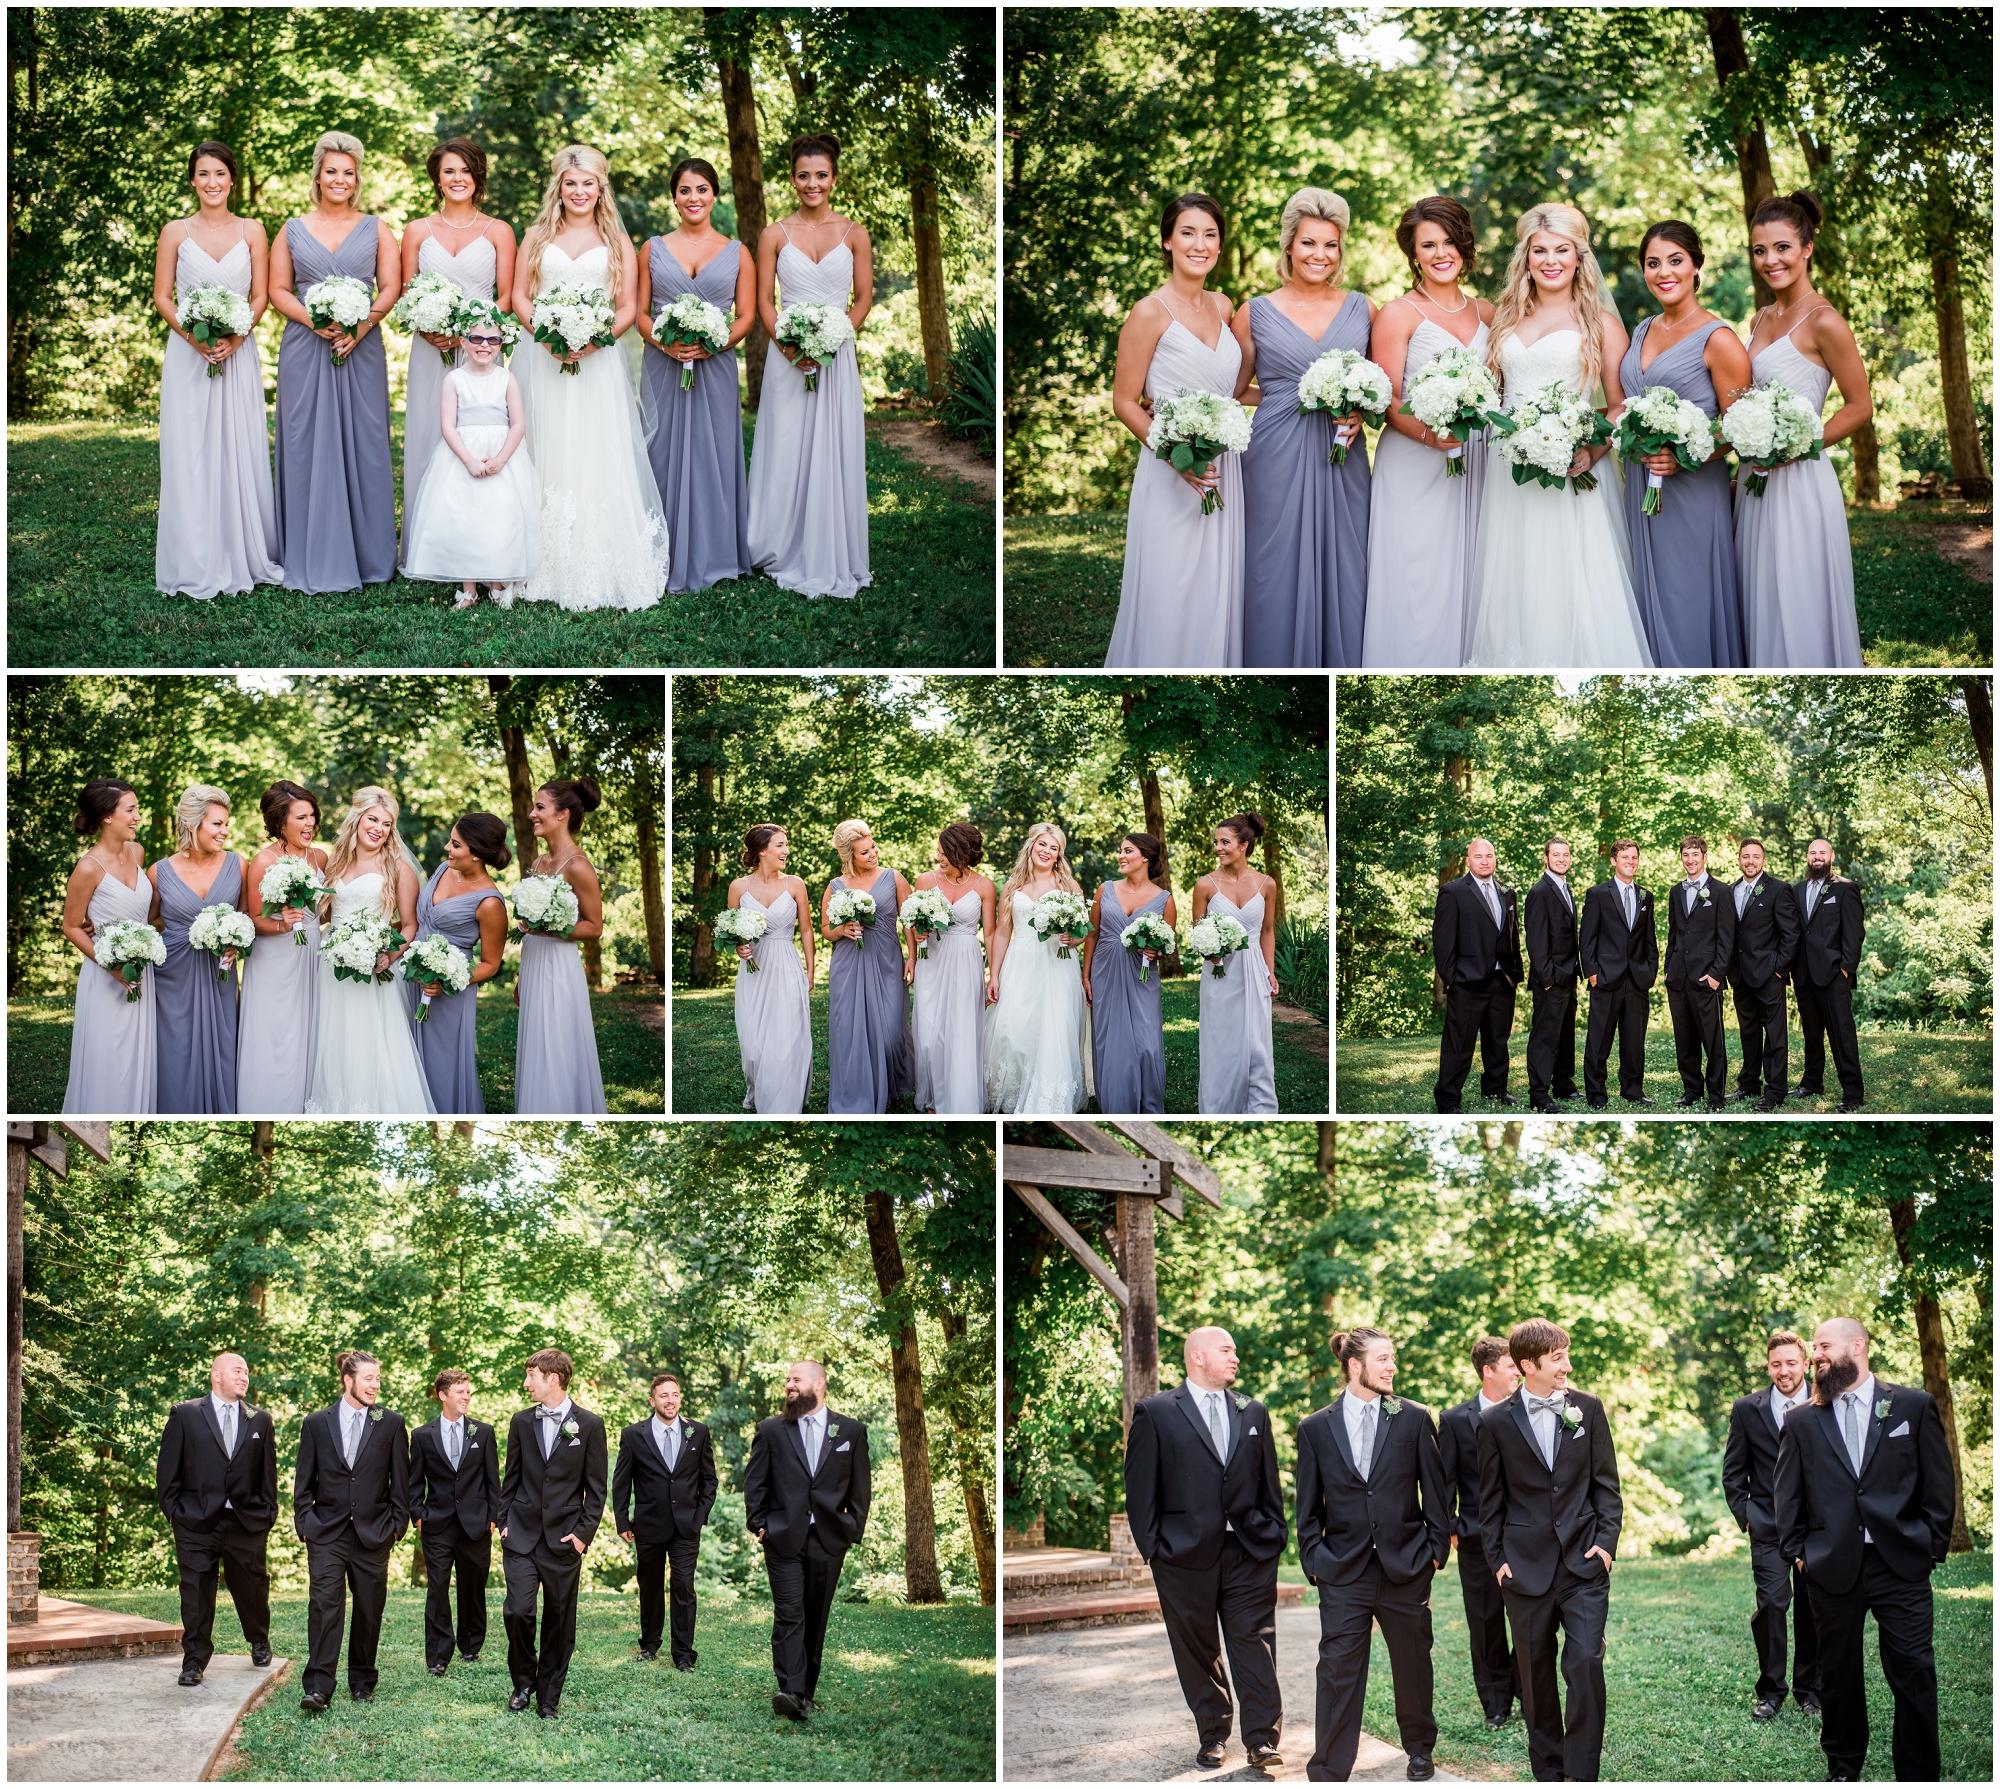 destyn_josh_casons_cove_wedding-1145.jpg